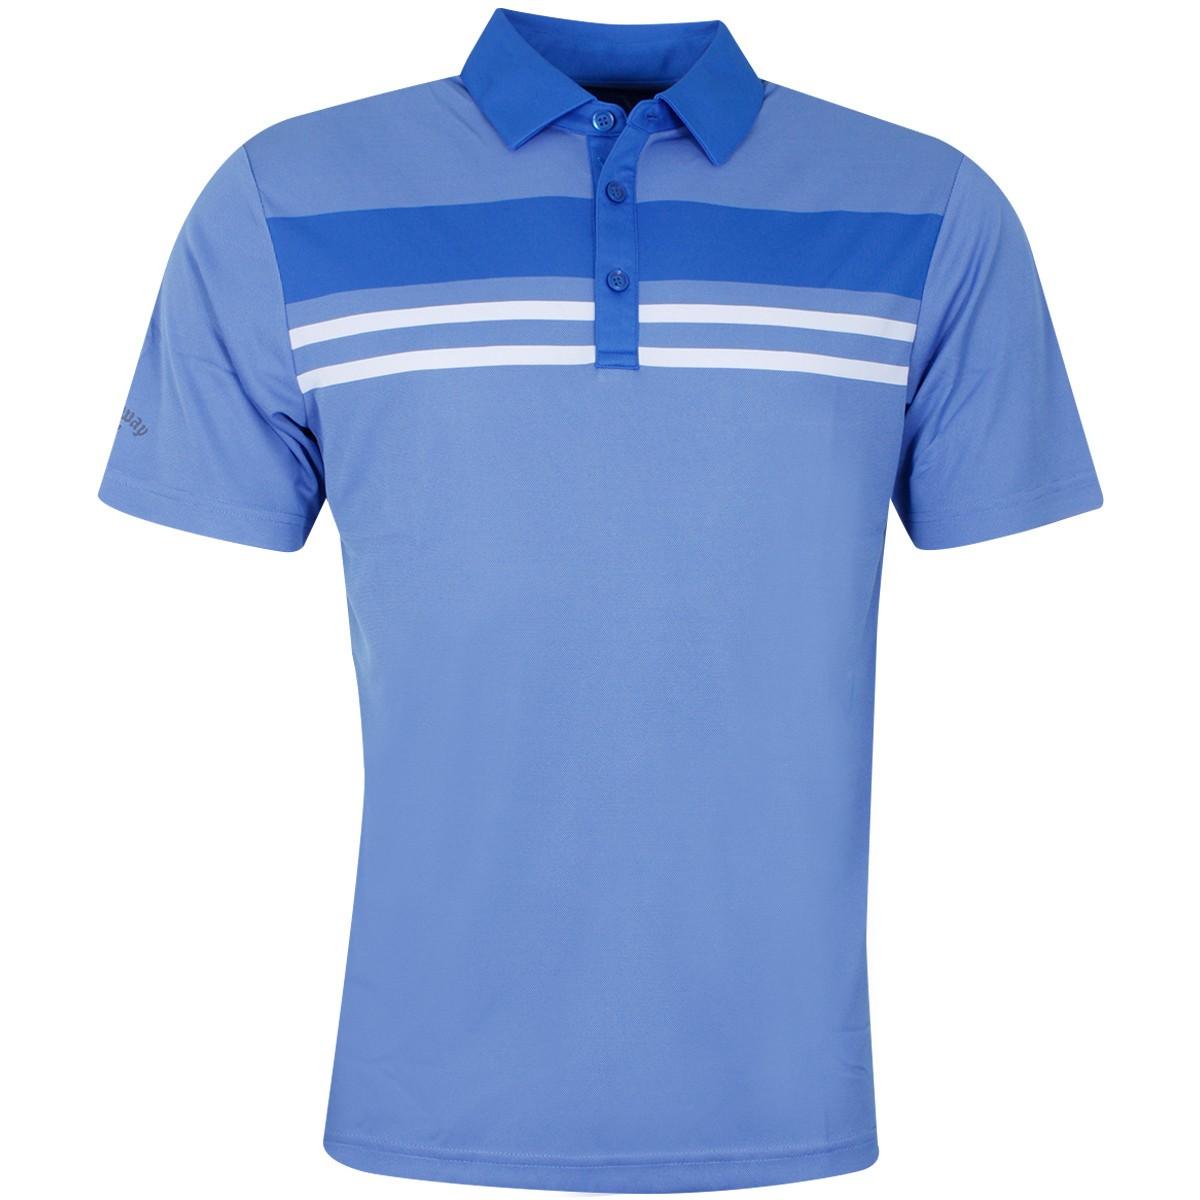 b019dc25e6d8 Callaway Mens 2019 Yarn Dye Chest Stripe Golf Polo Shirt